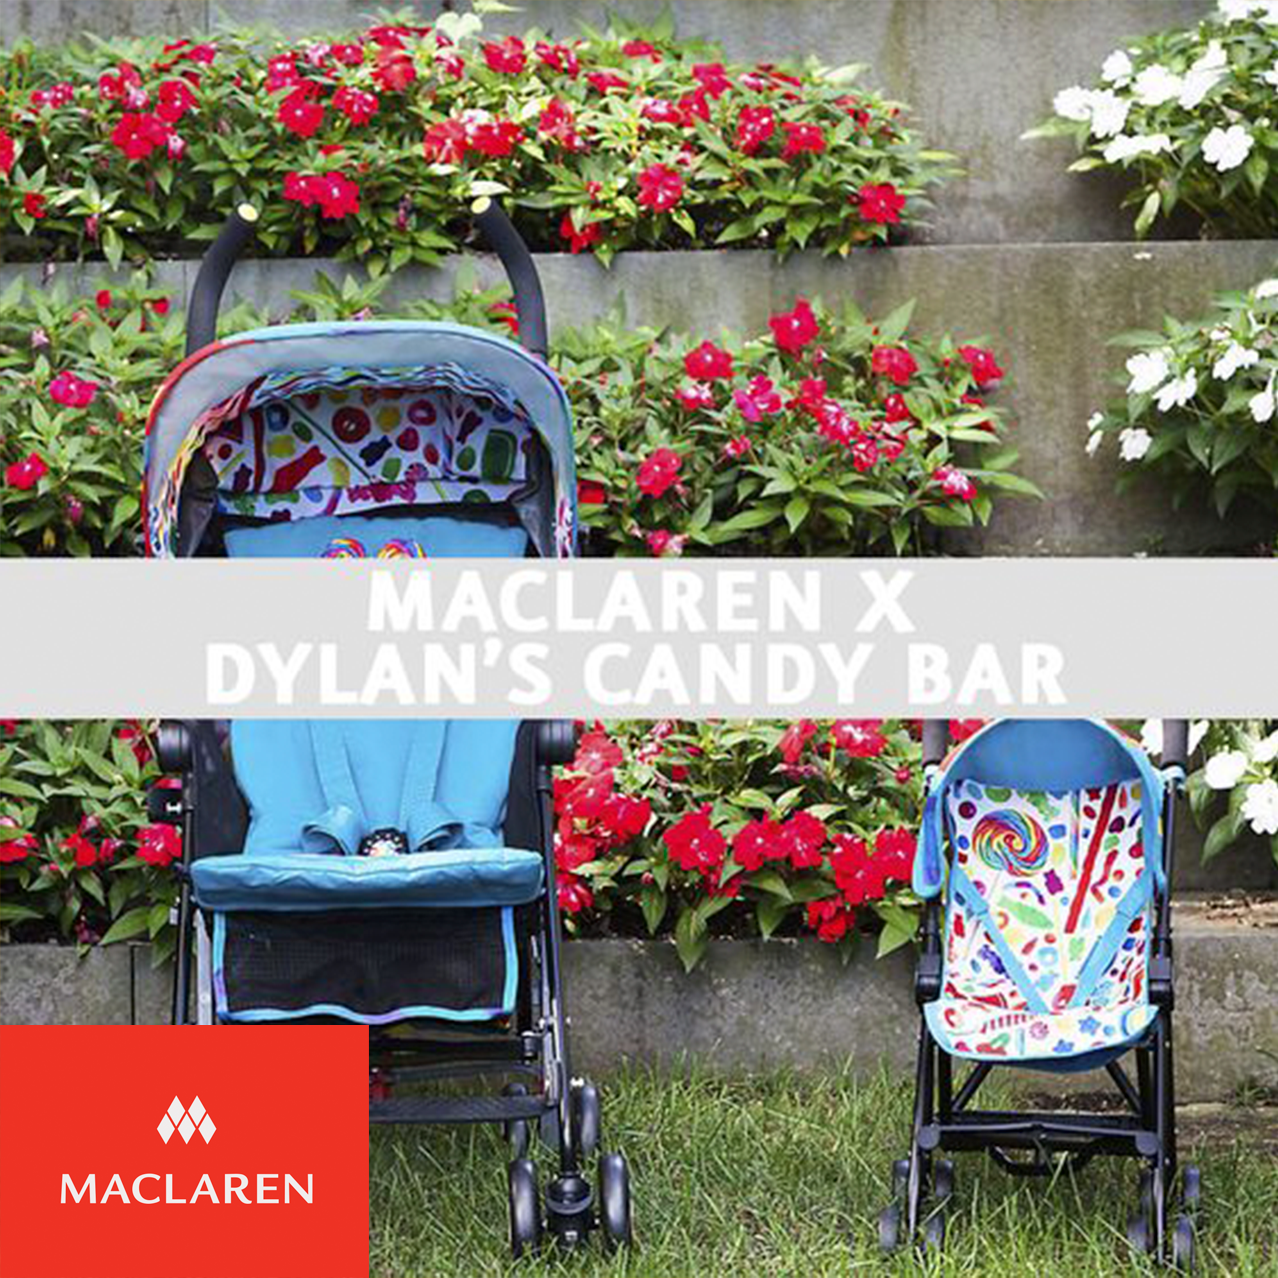 Pin by Maclaren on Maclaren X Dylan's Candy Bar Dylan's